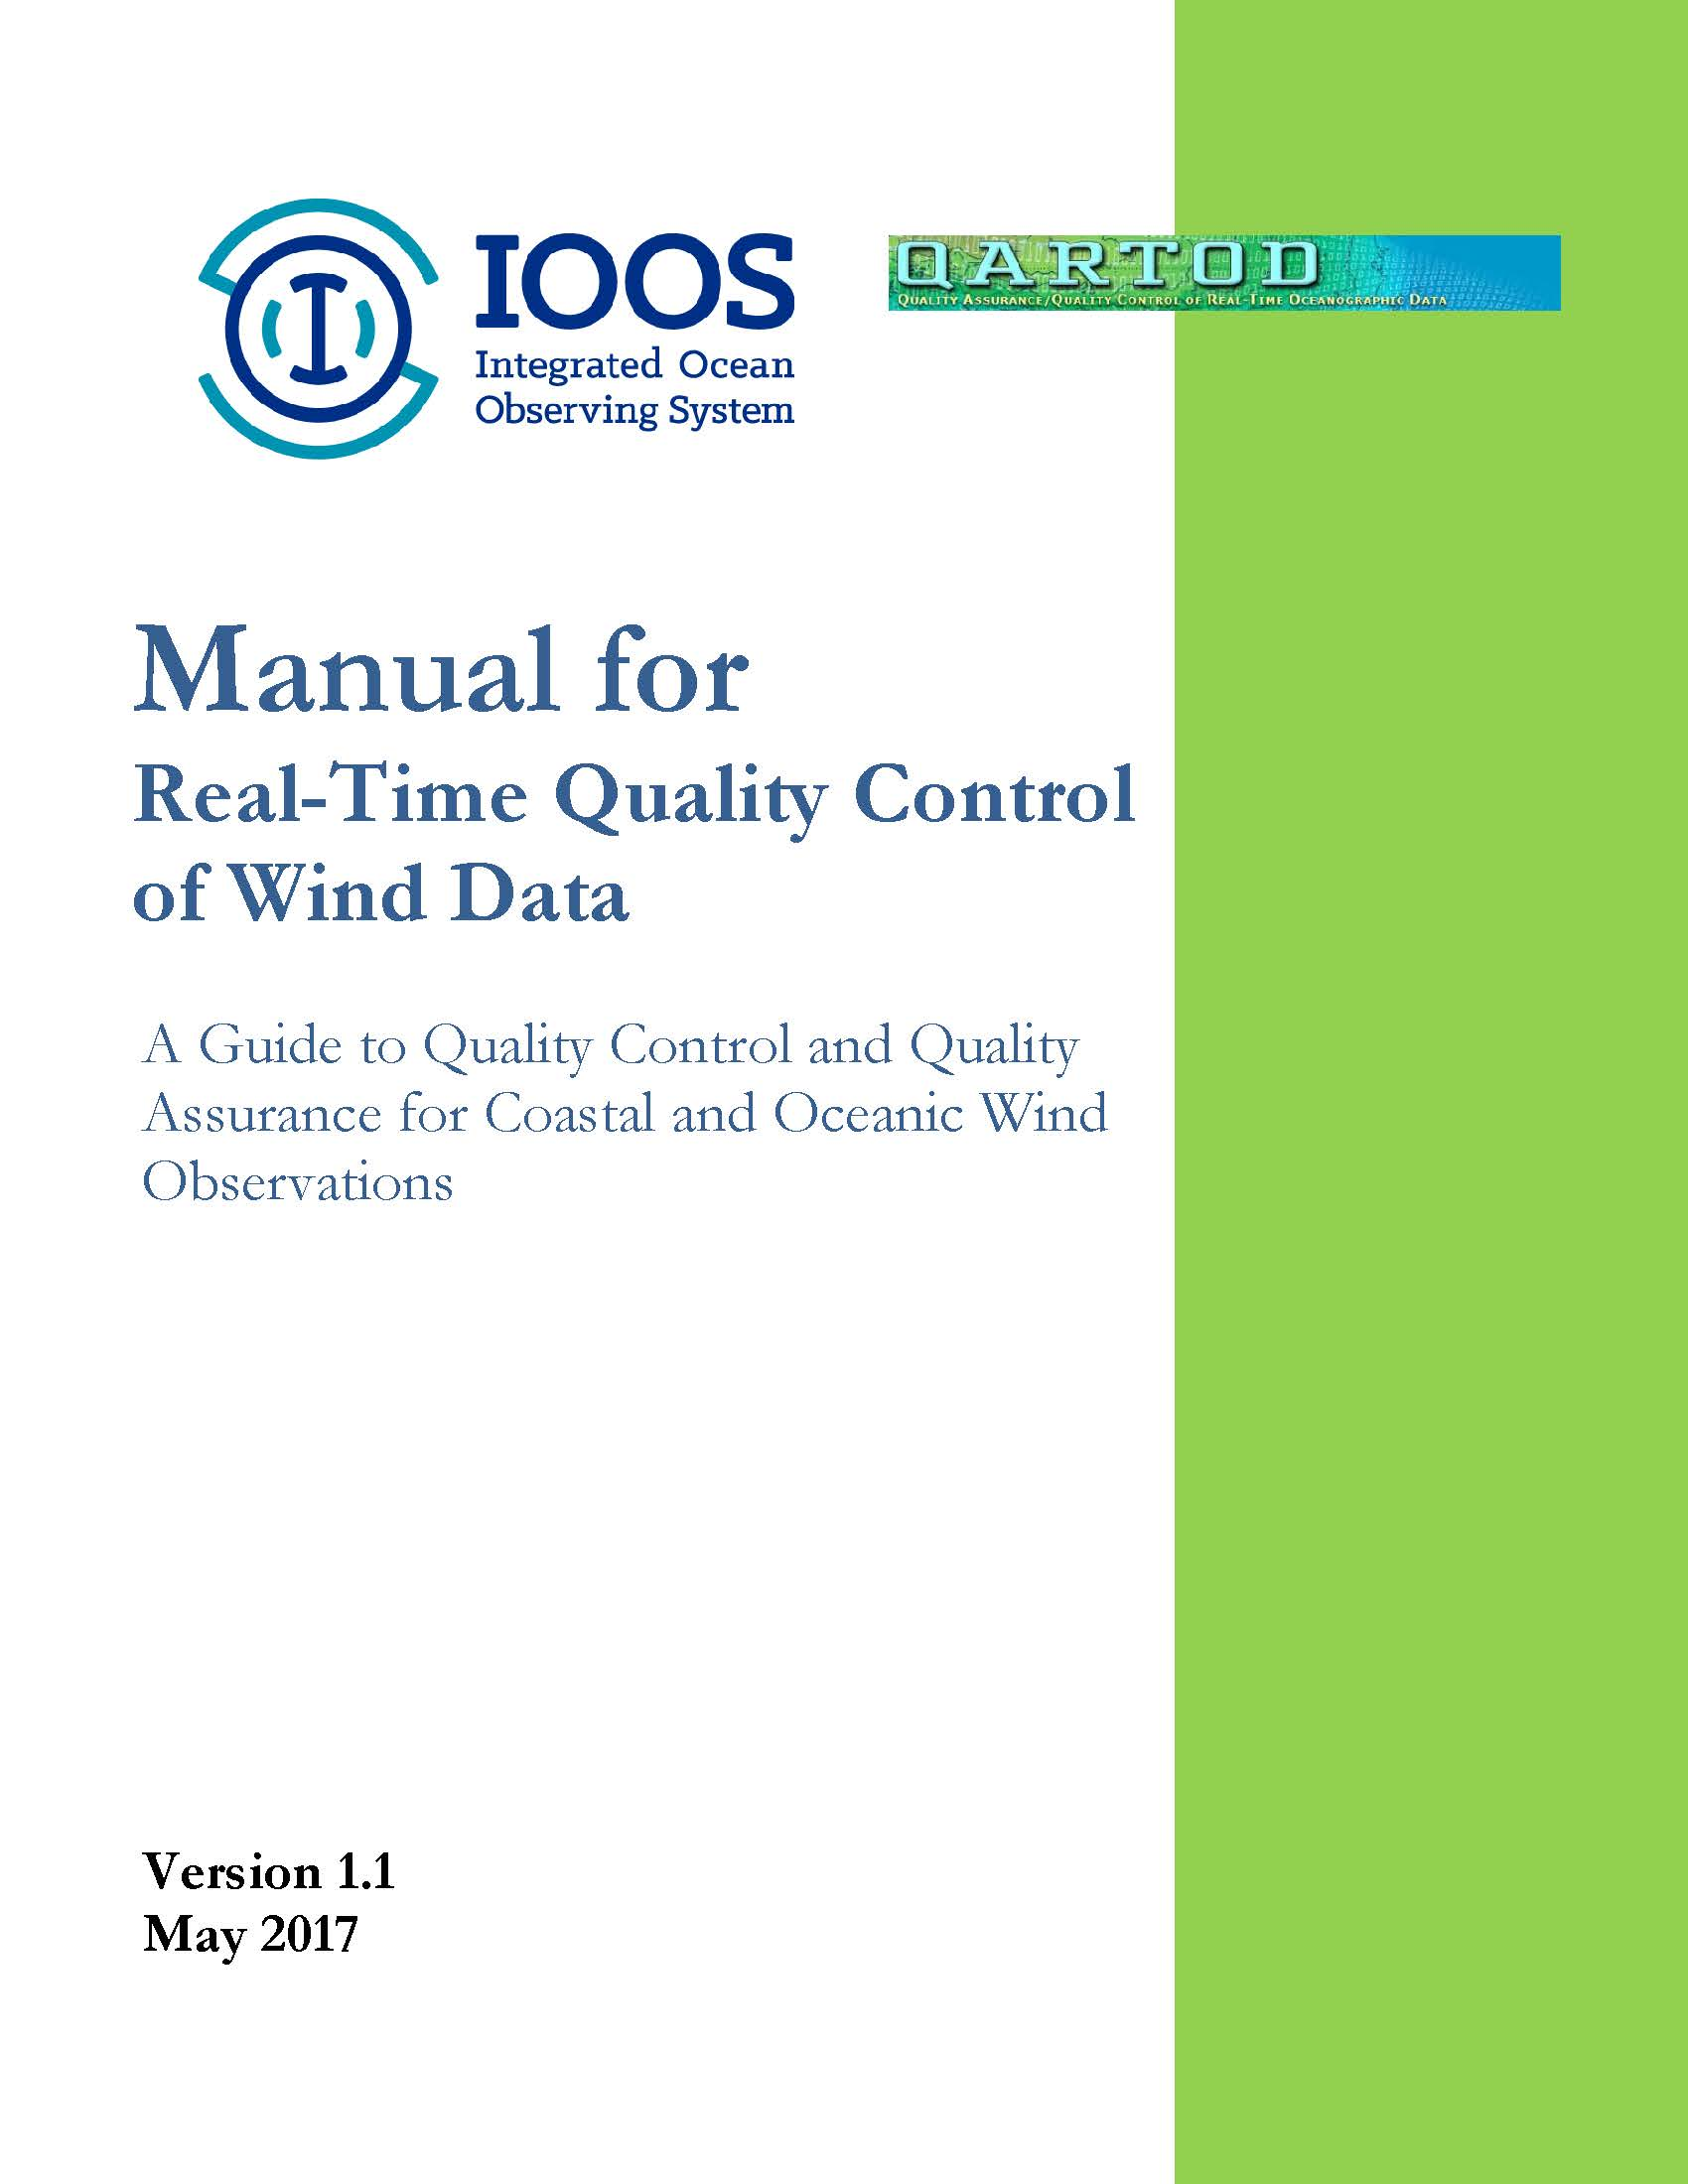 QARTOD wind manual